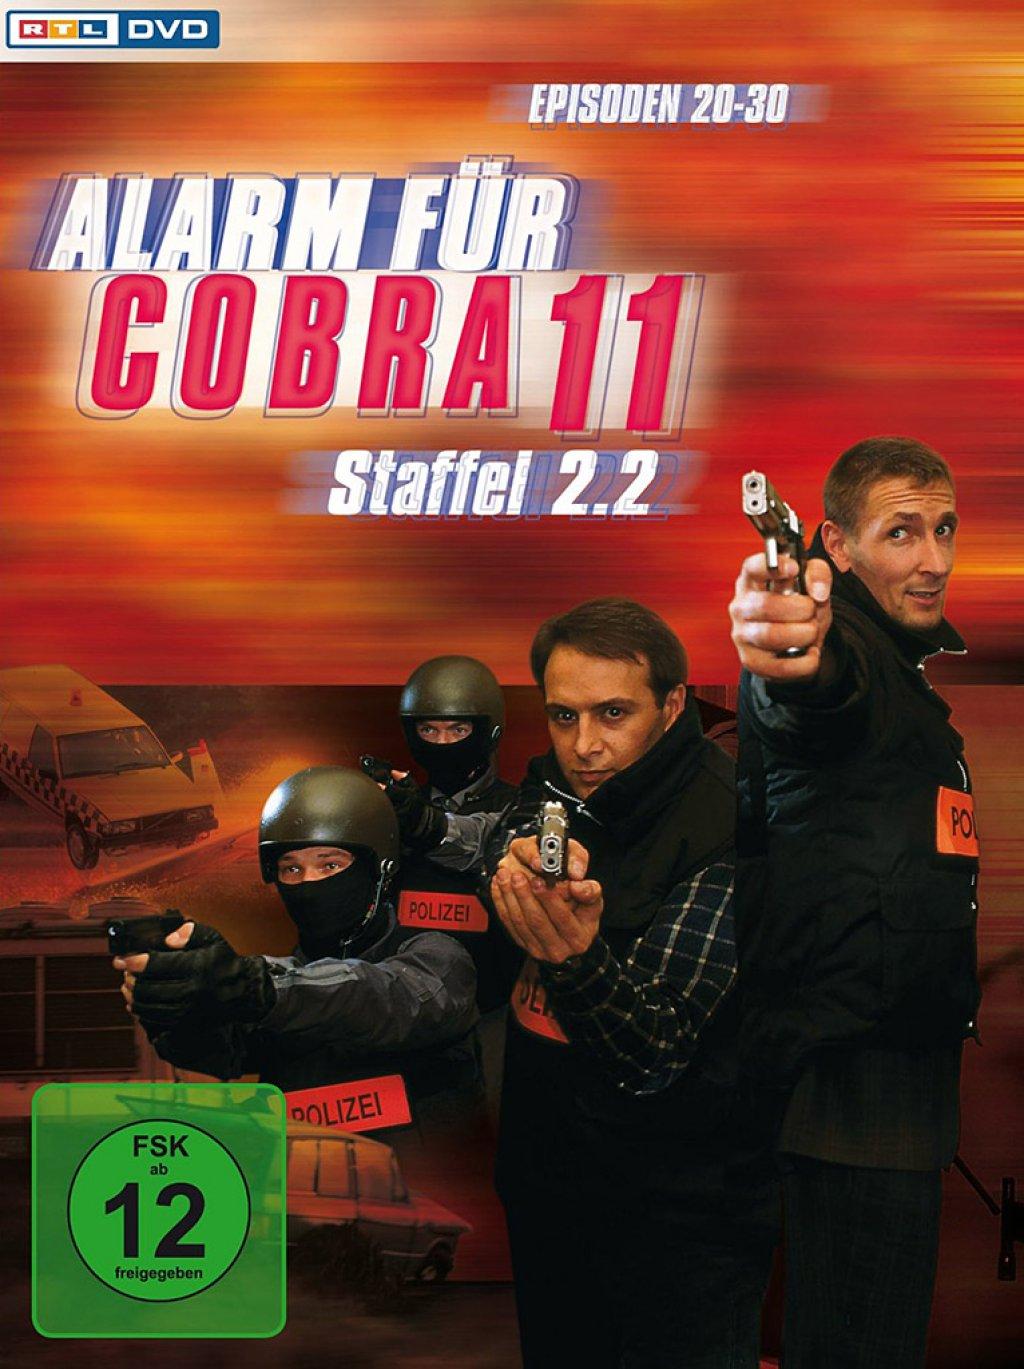 Alarm für Cobra 11 - Staffel 2.2 (DVD)